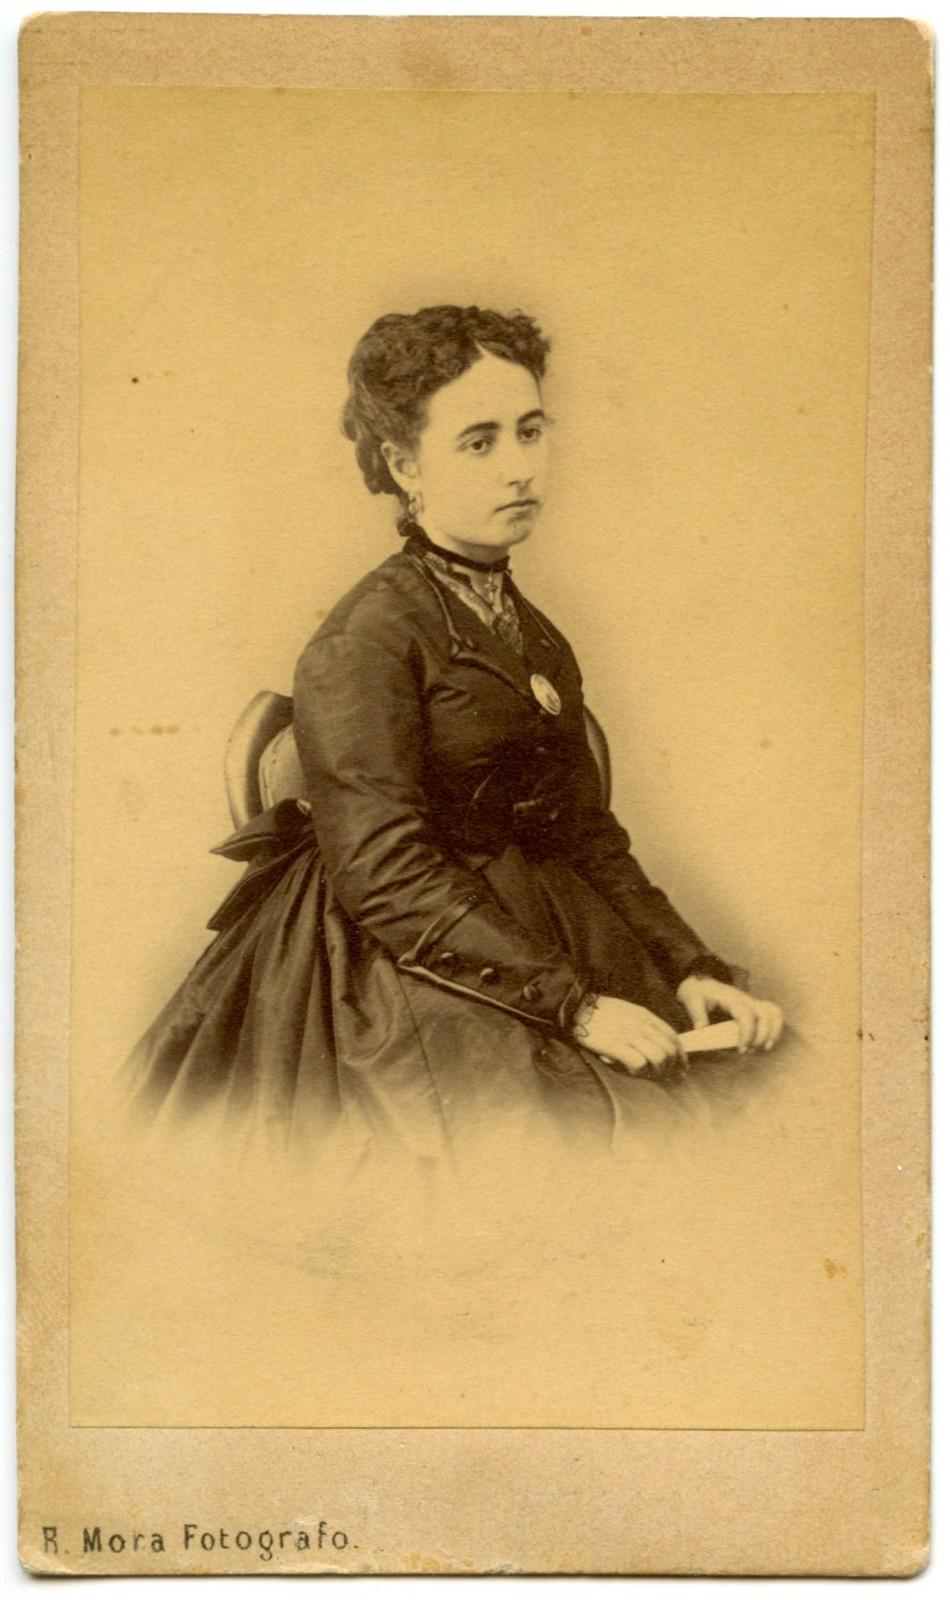 61 dos mujeres dos fot grafos toledo 1870 - Fotografo toledo ...